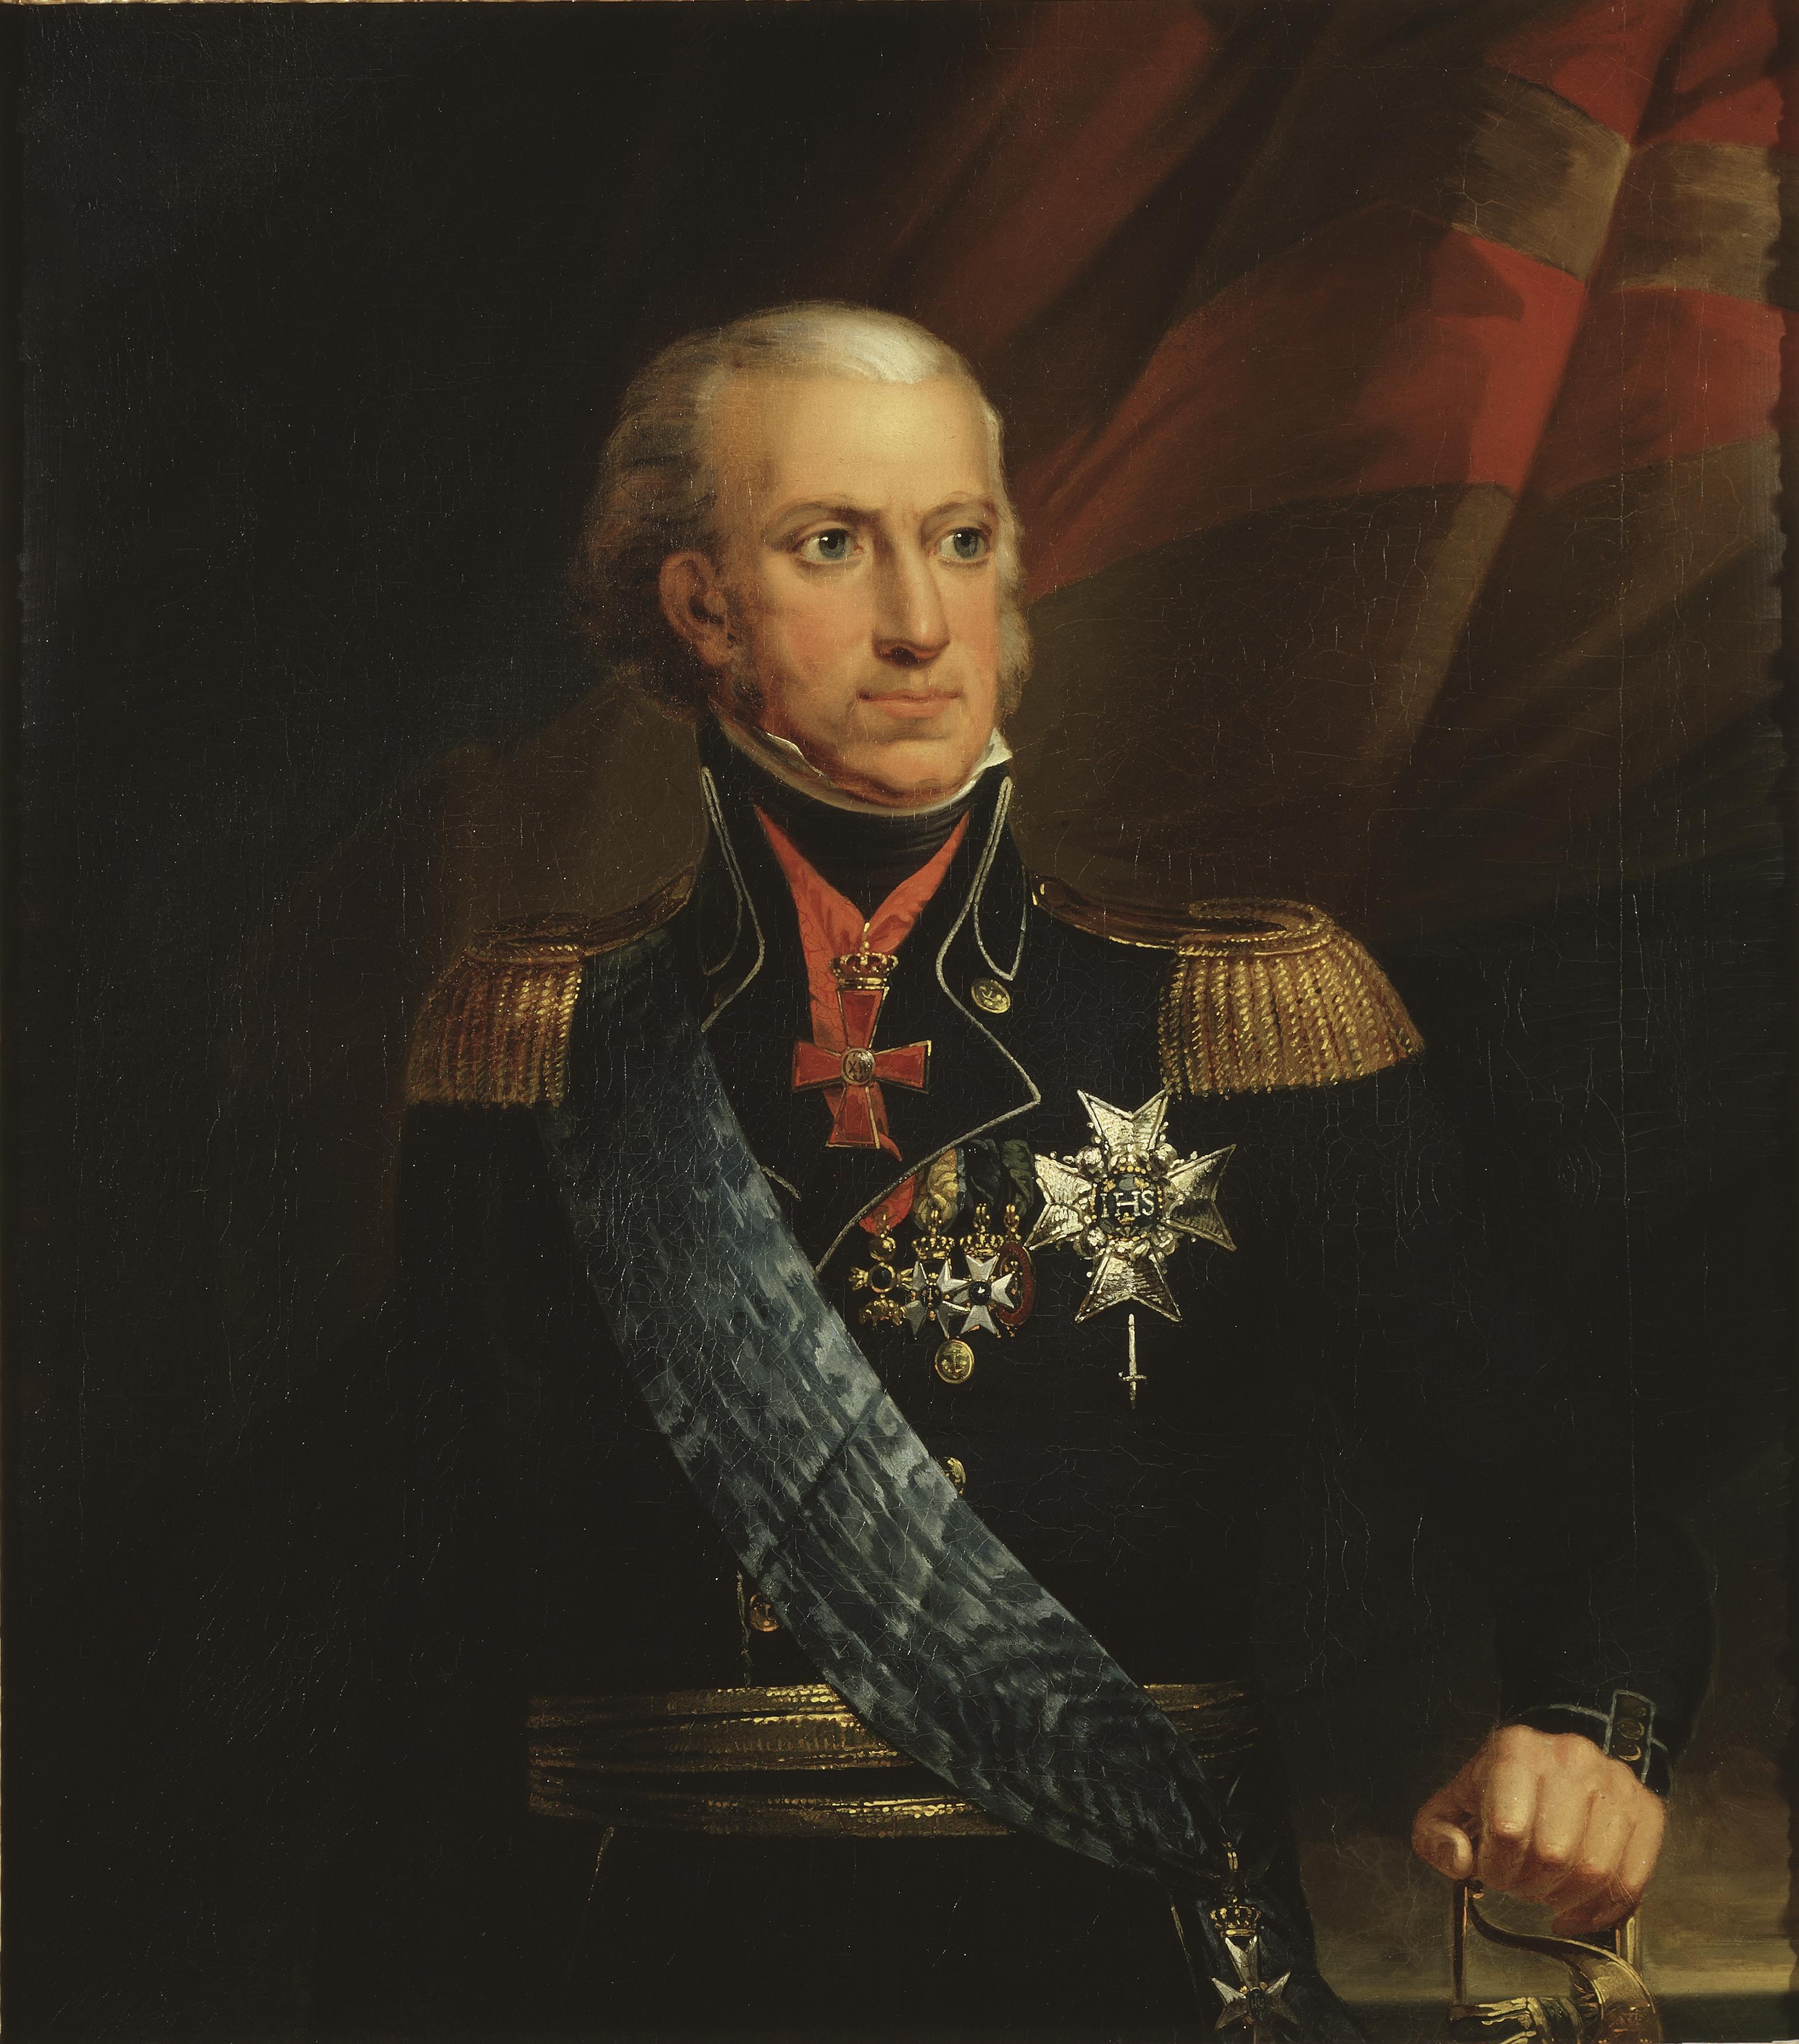 Карл XIII (Швеция) – Уикипедия